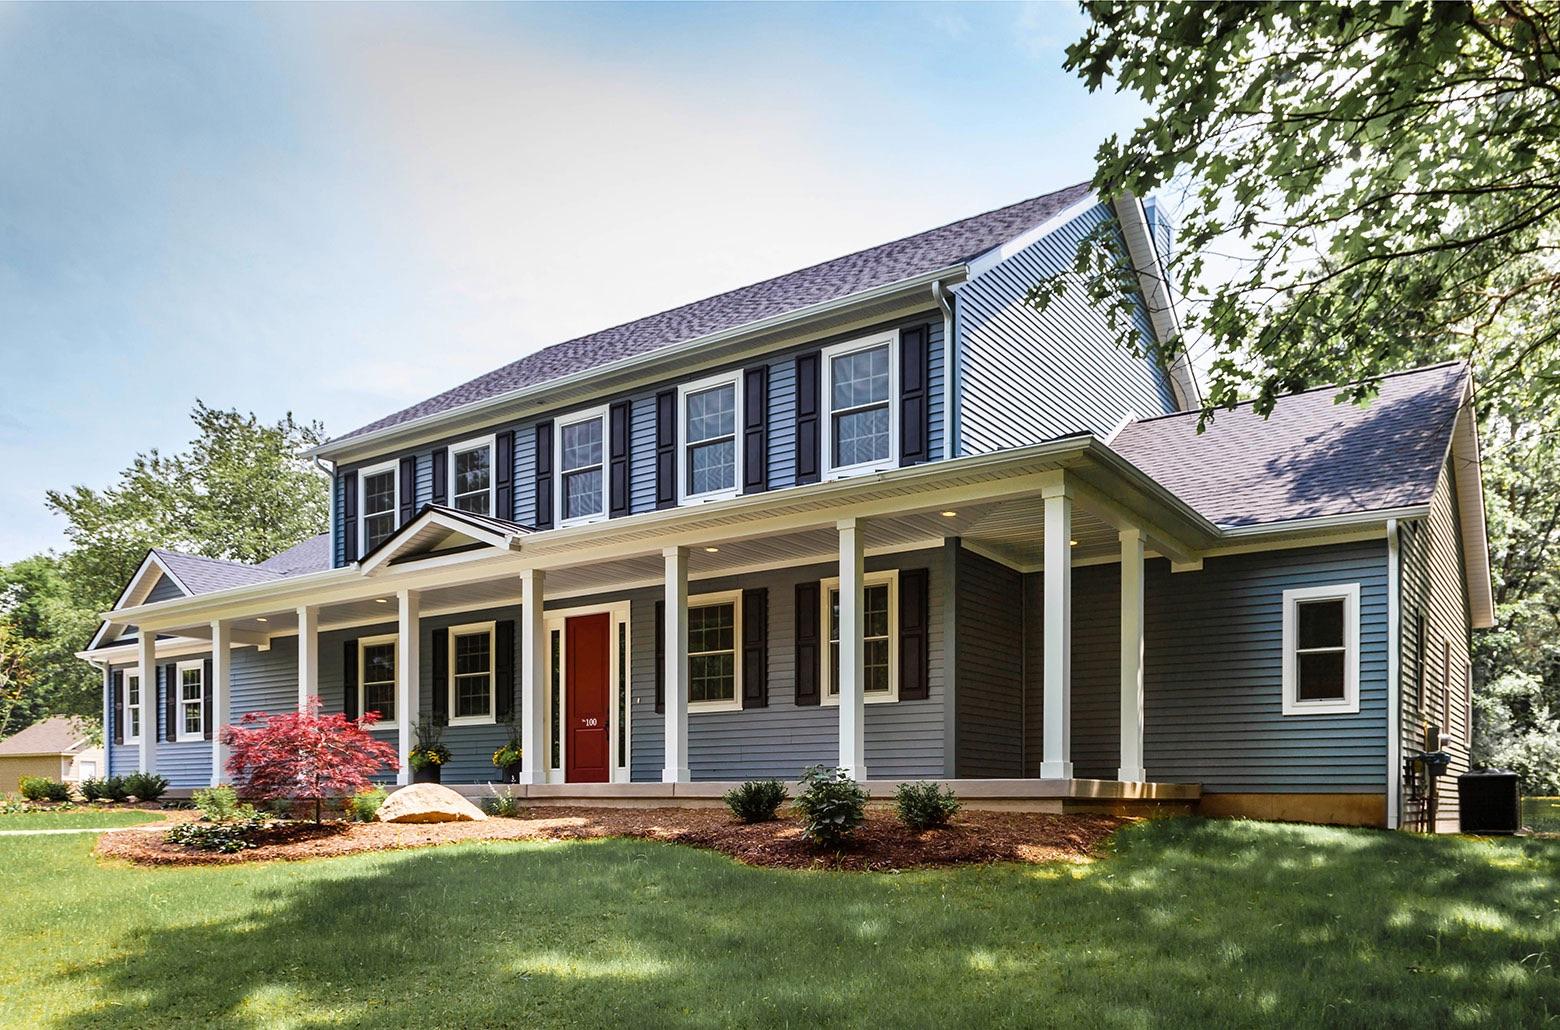 ADA accessible house exterior